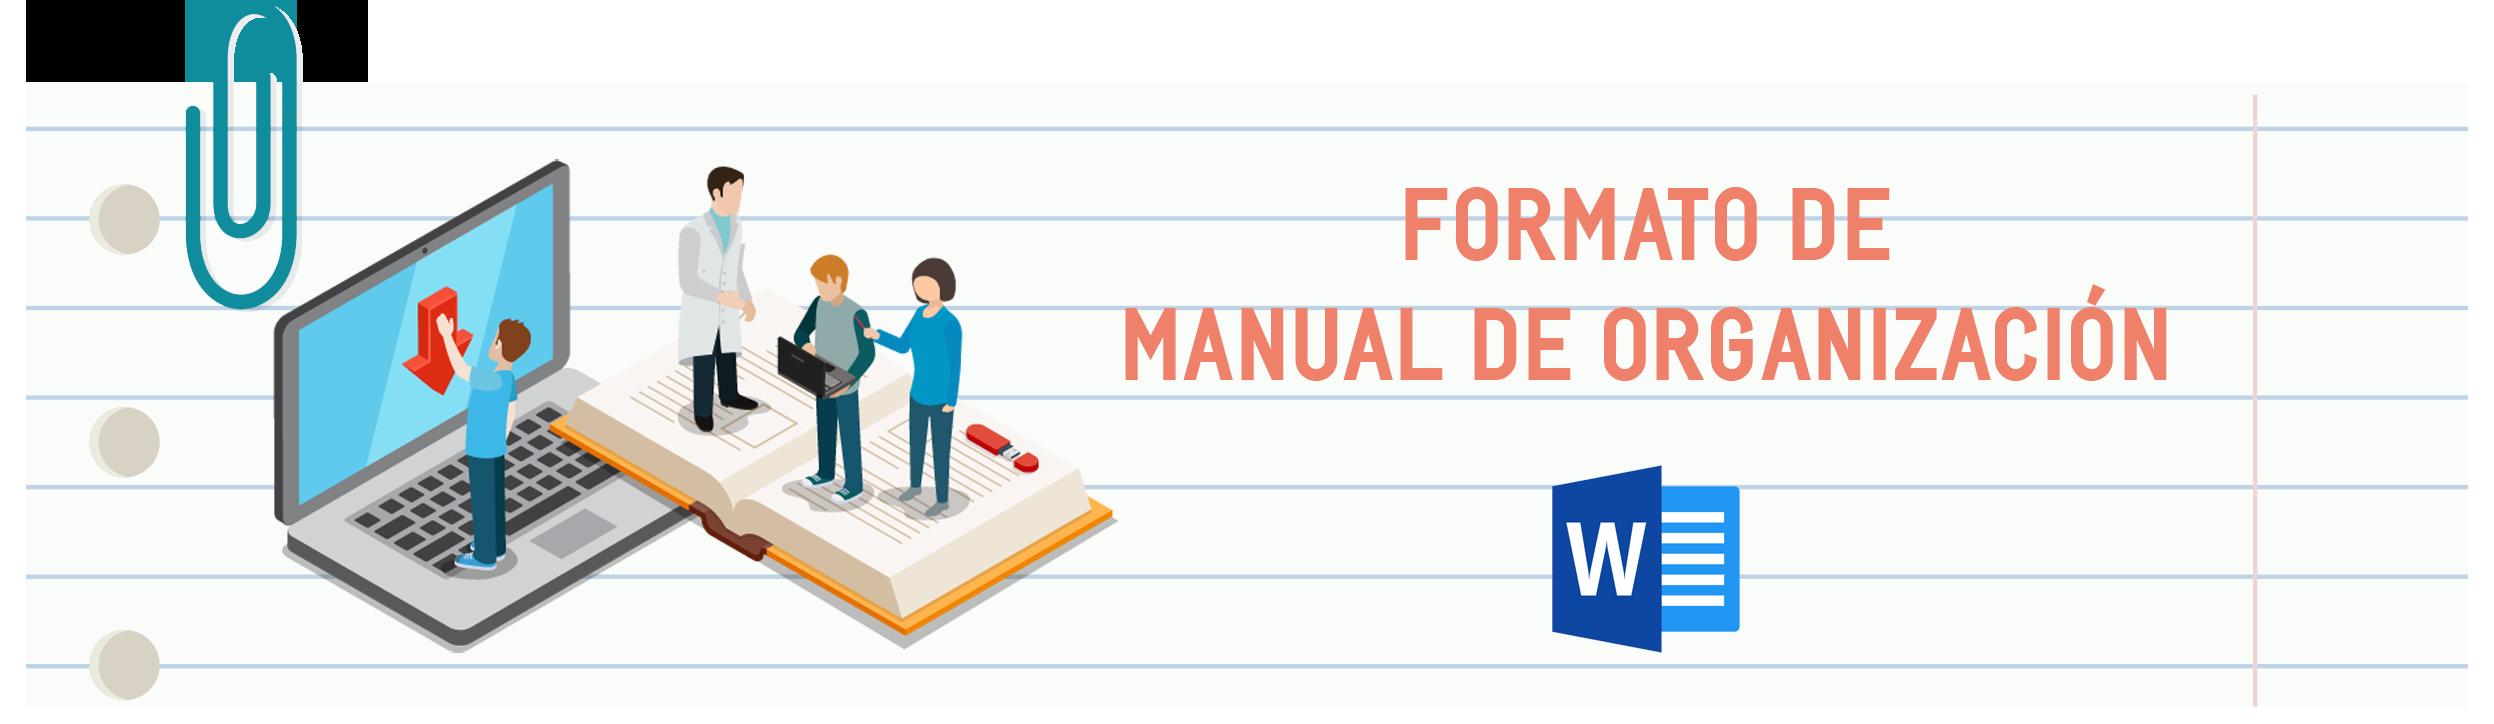 formato_manual_organizacion.png